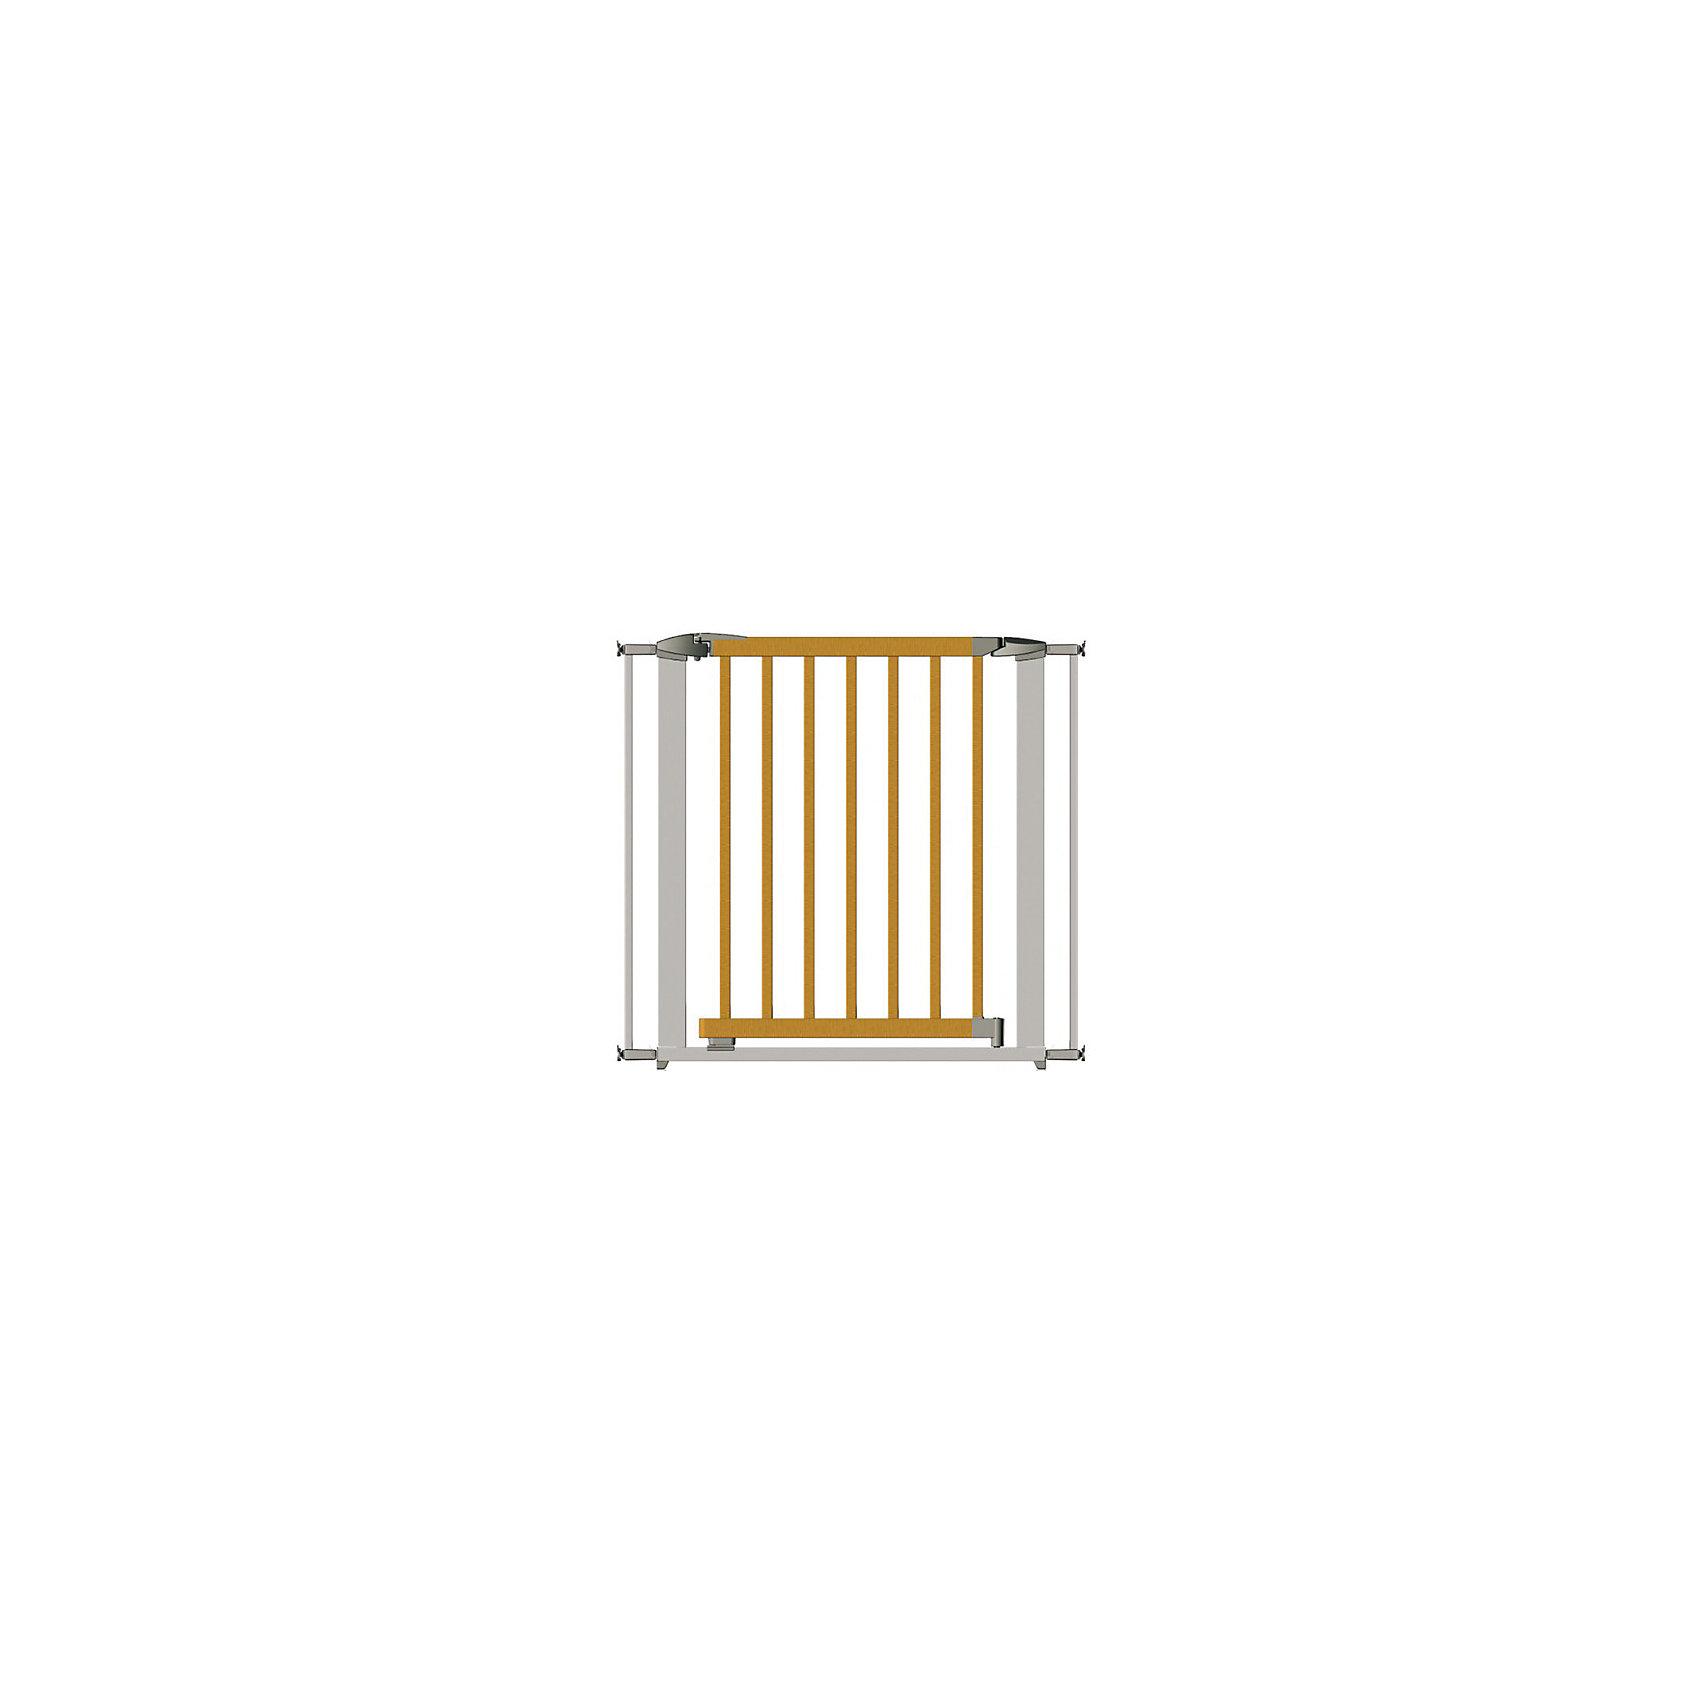 Clippasafe Ворота безопасности 73-96 см, Clippasafe, серебристый ворота безопасности 73 96см clippasafe белый cl130